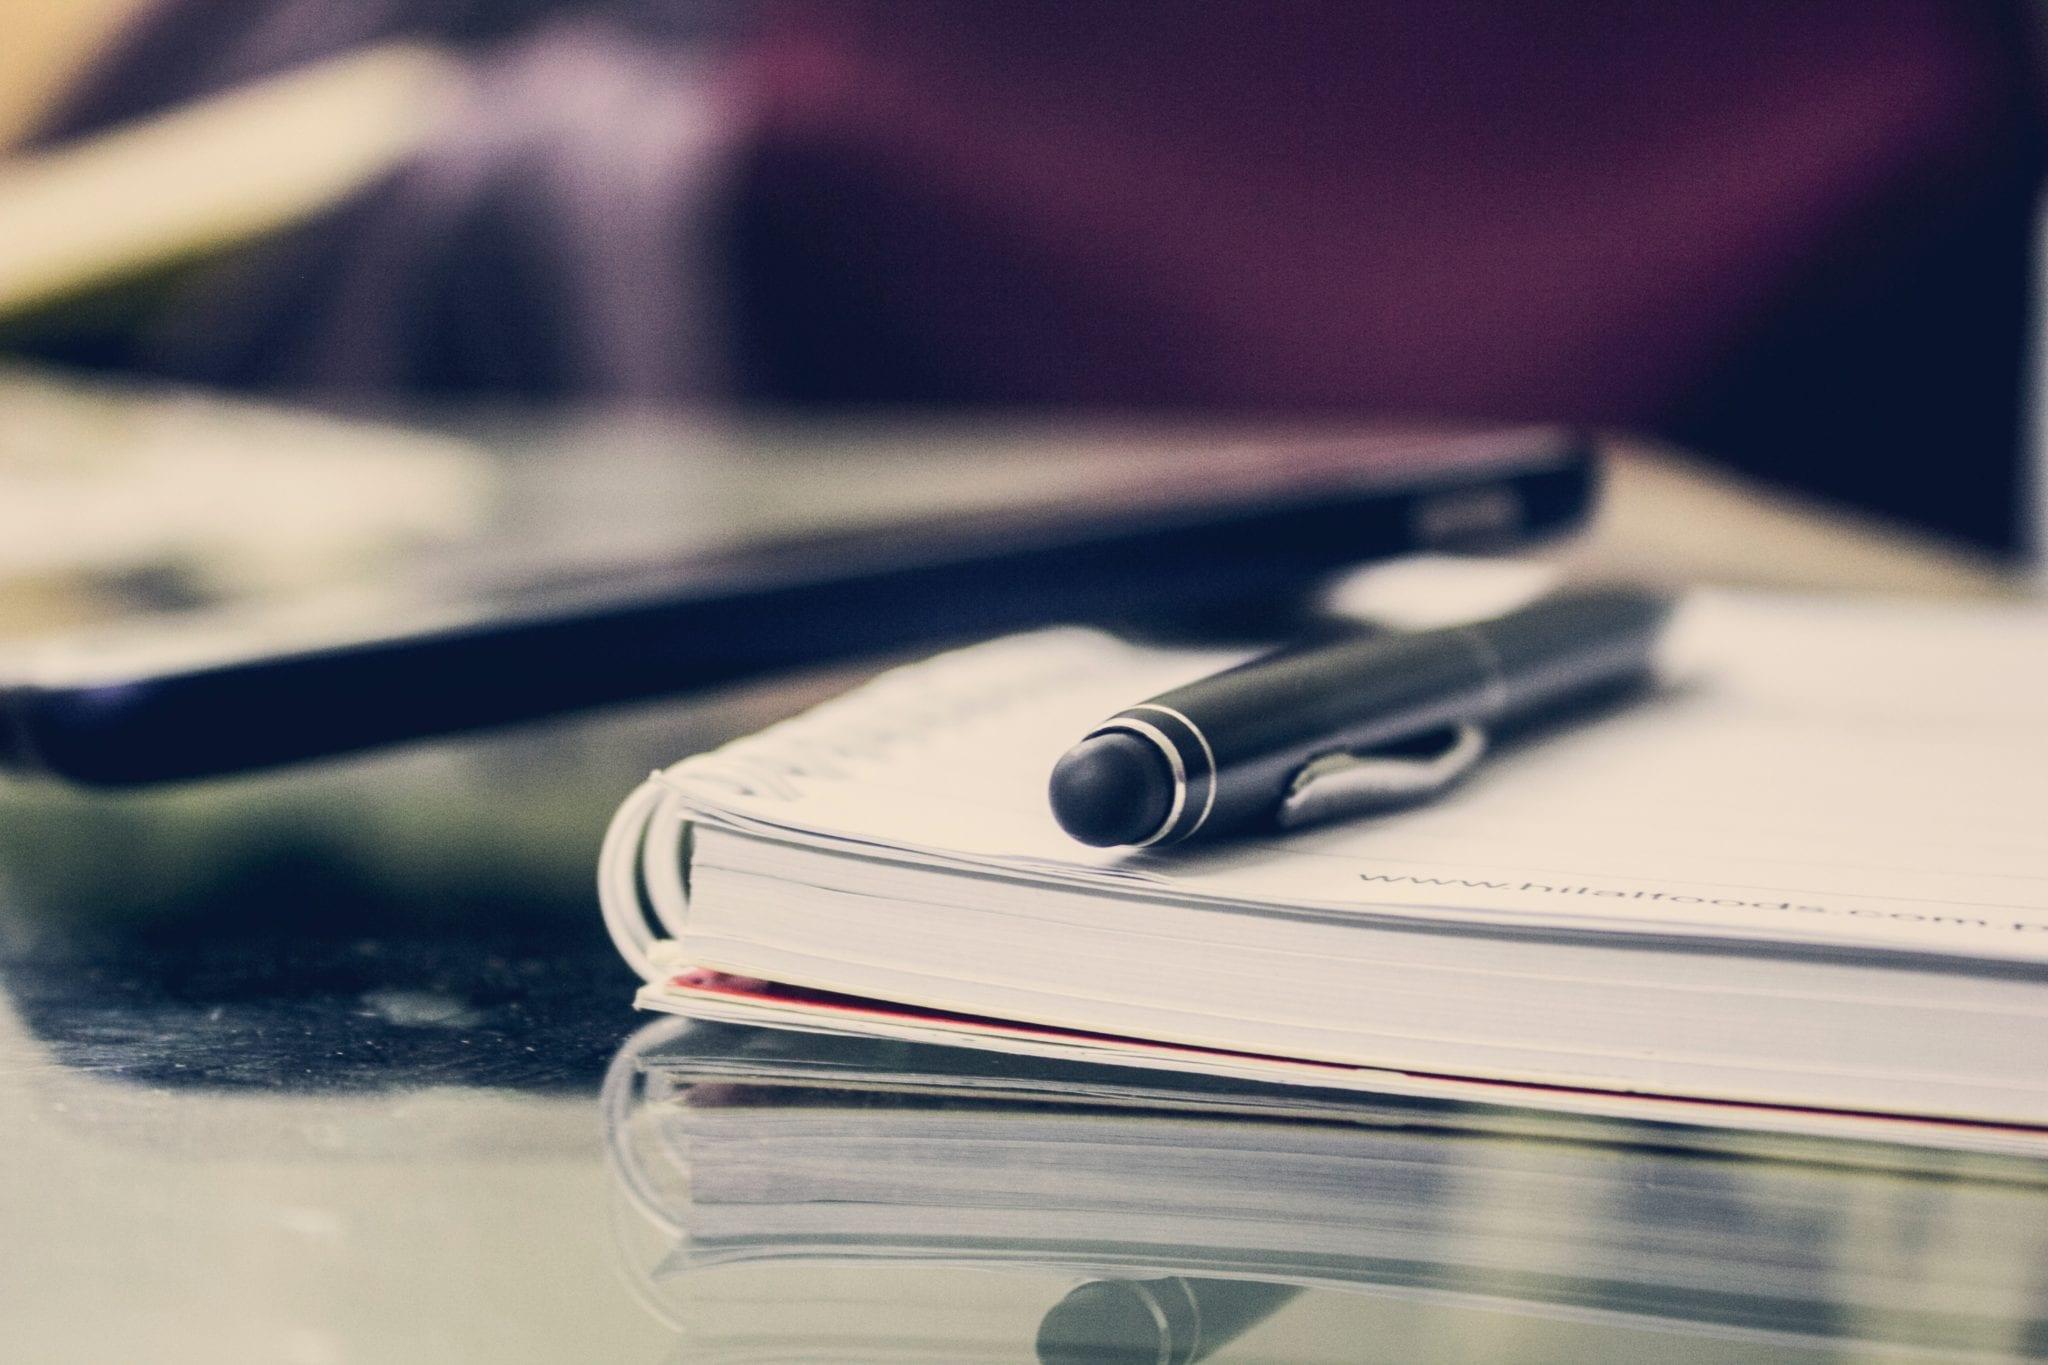 book-bindings-composition-desk-891059